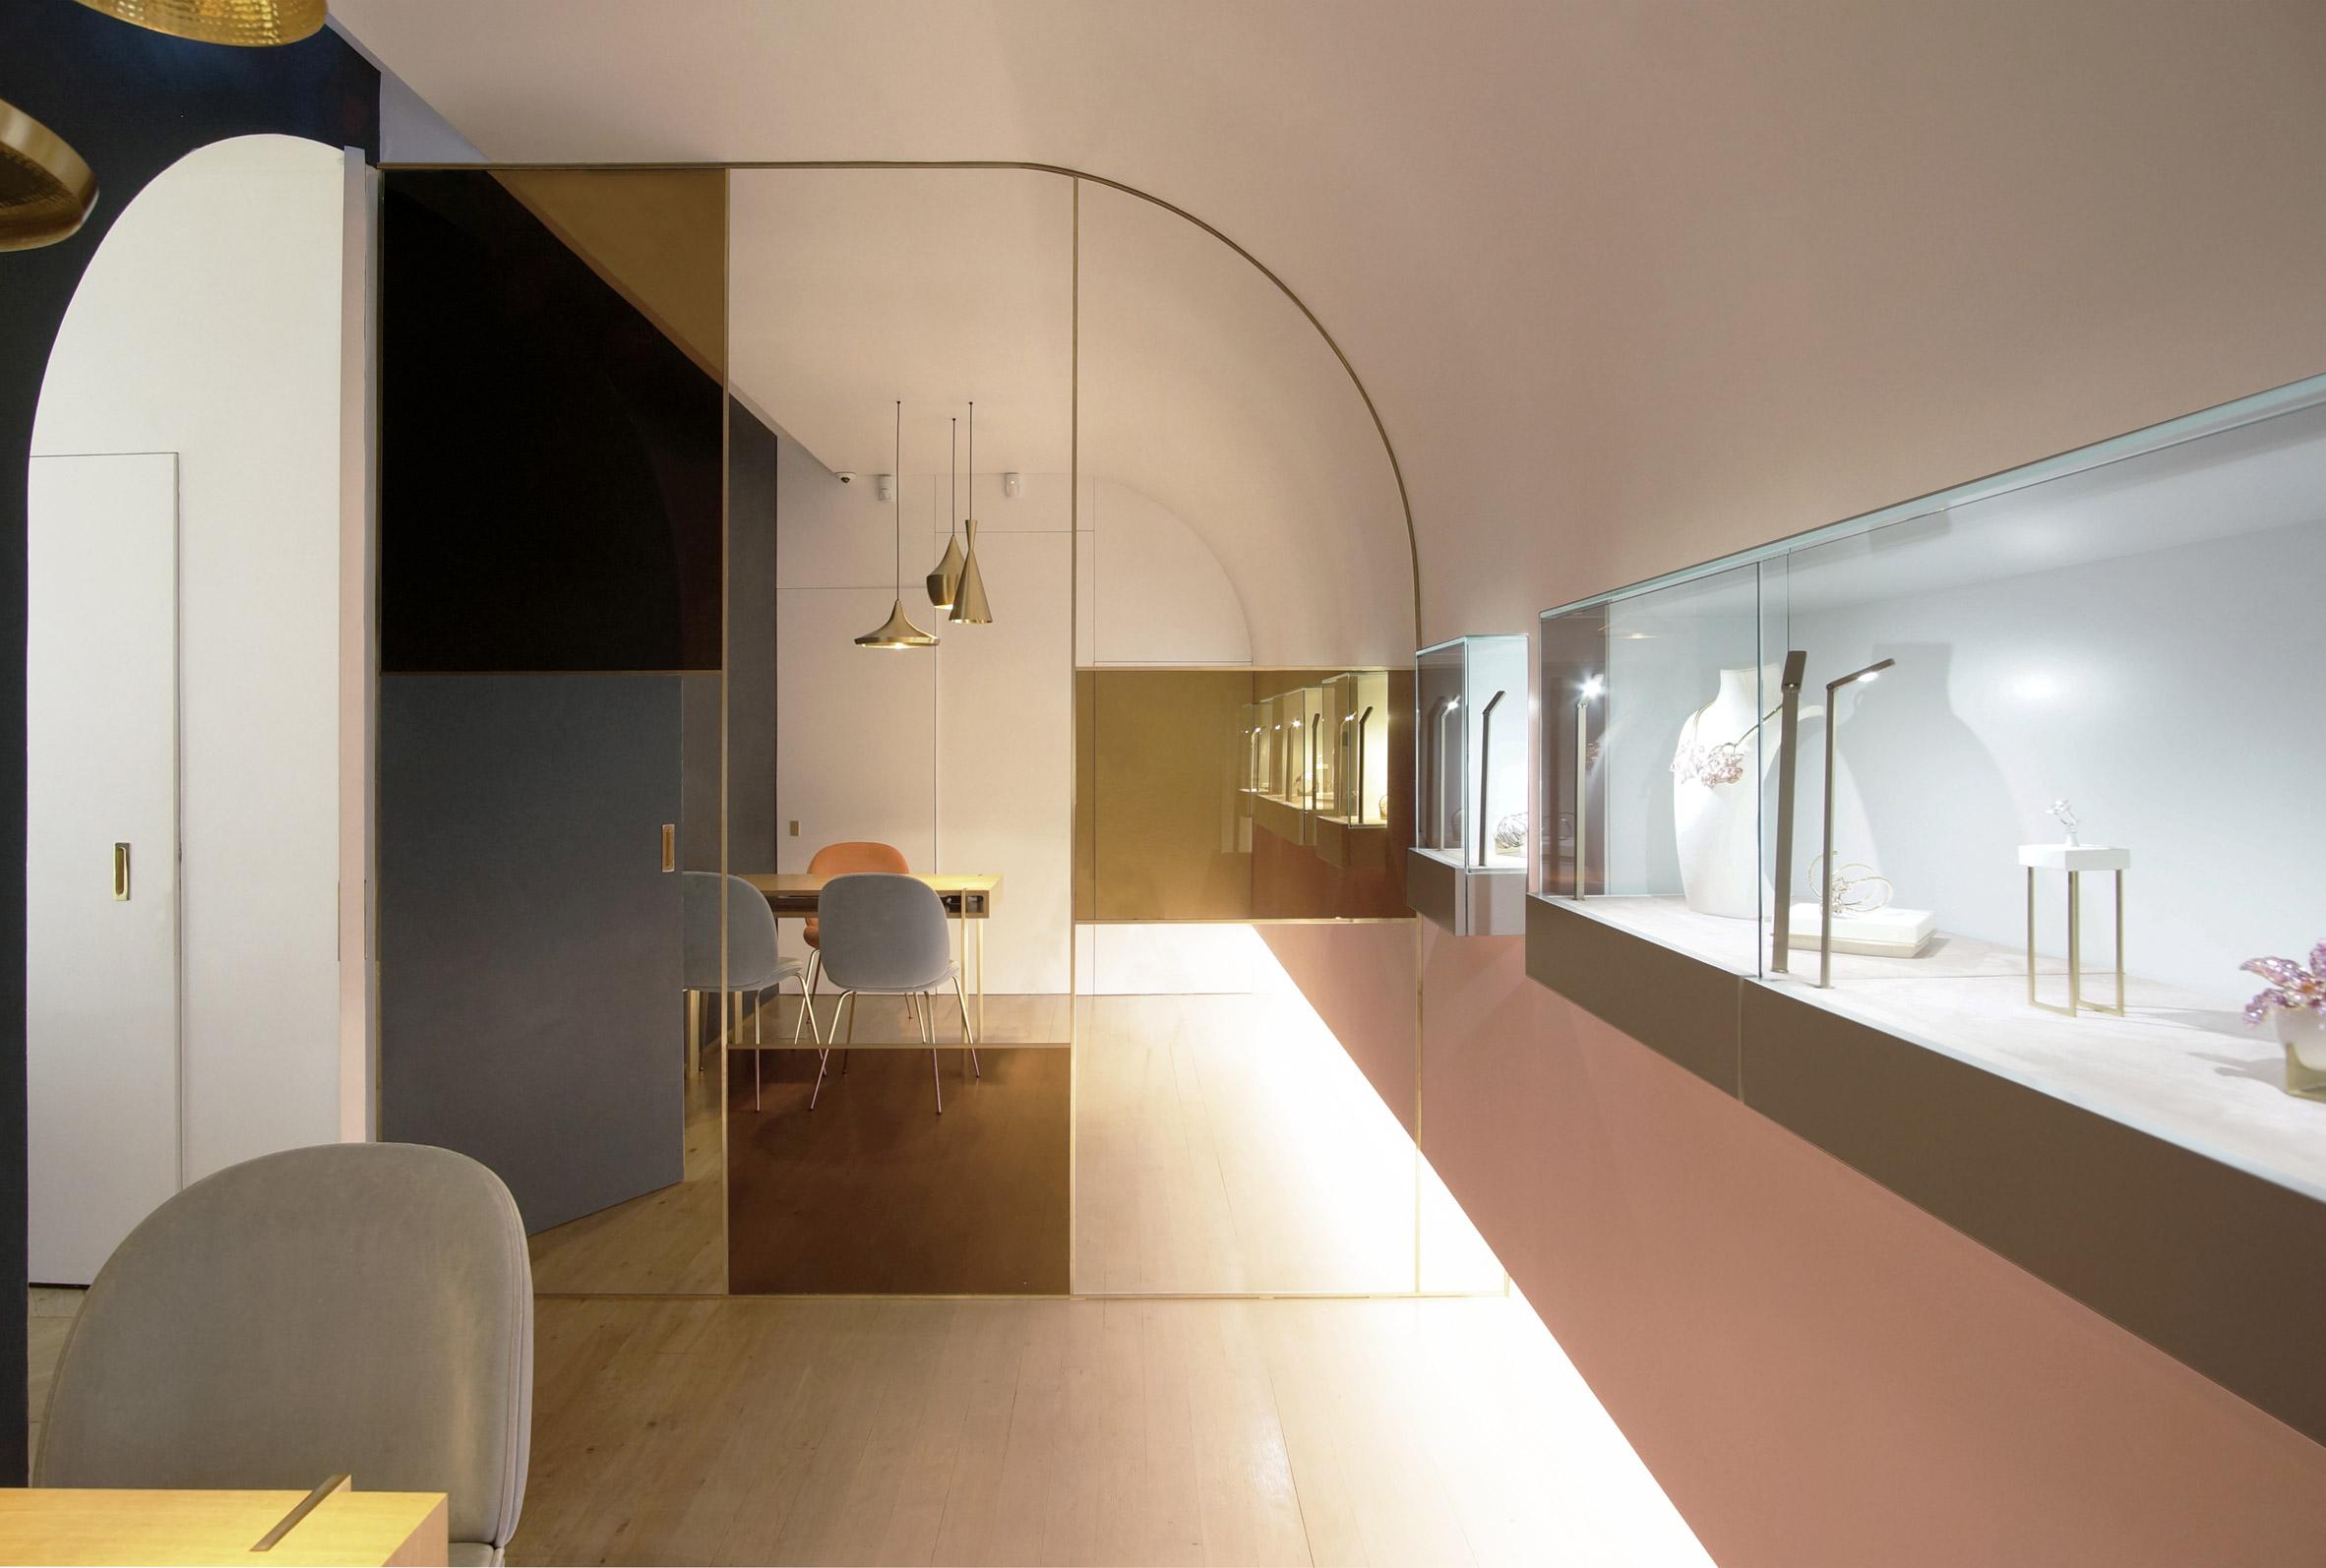 nuun-jewellery-shop-java-architectes-interiors-retail-paris-france_dezeen_2364_col_4.jpg